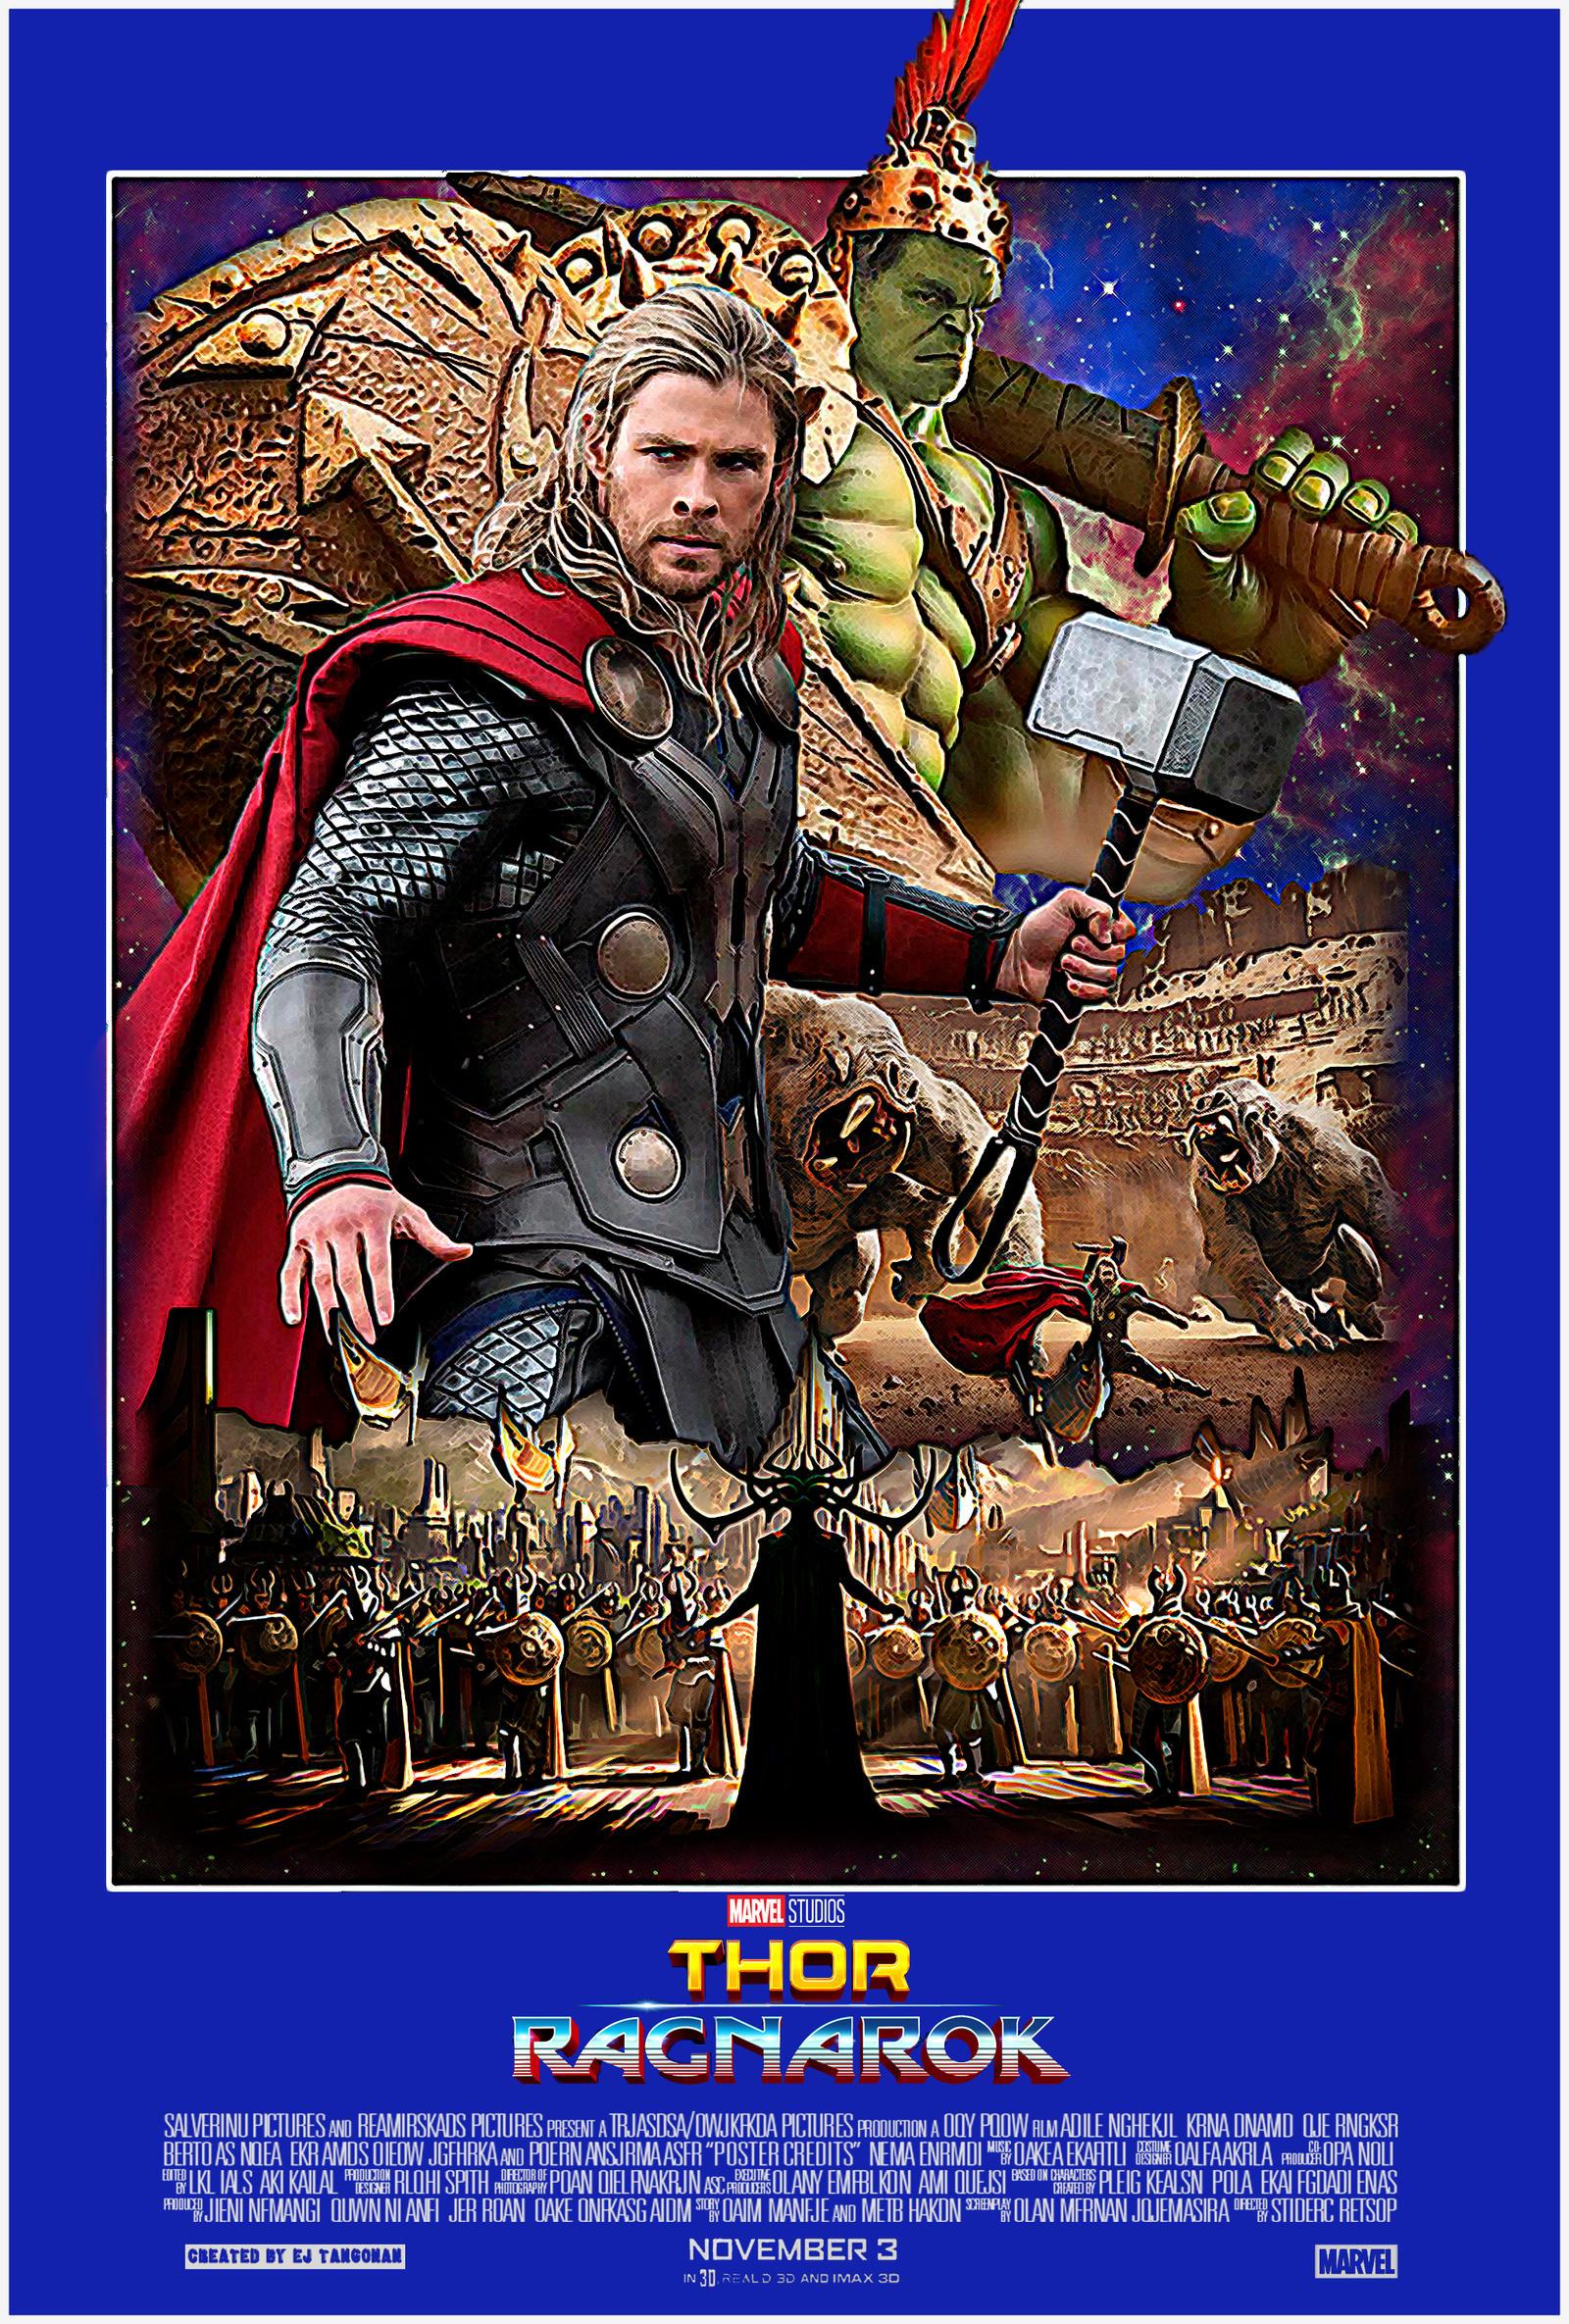 Thor Ragnarok 80s poster by EJTangonan